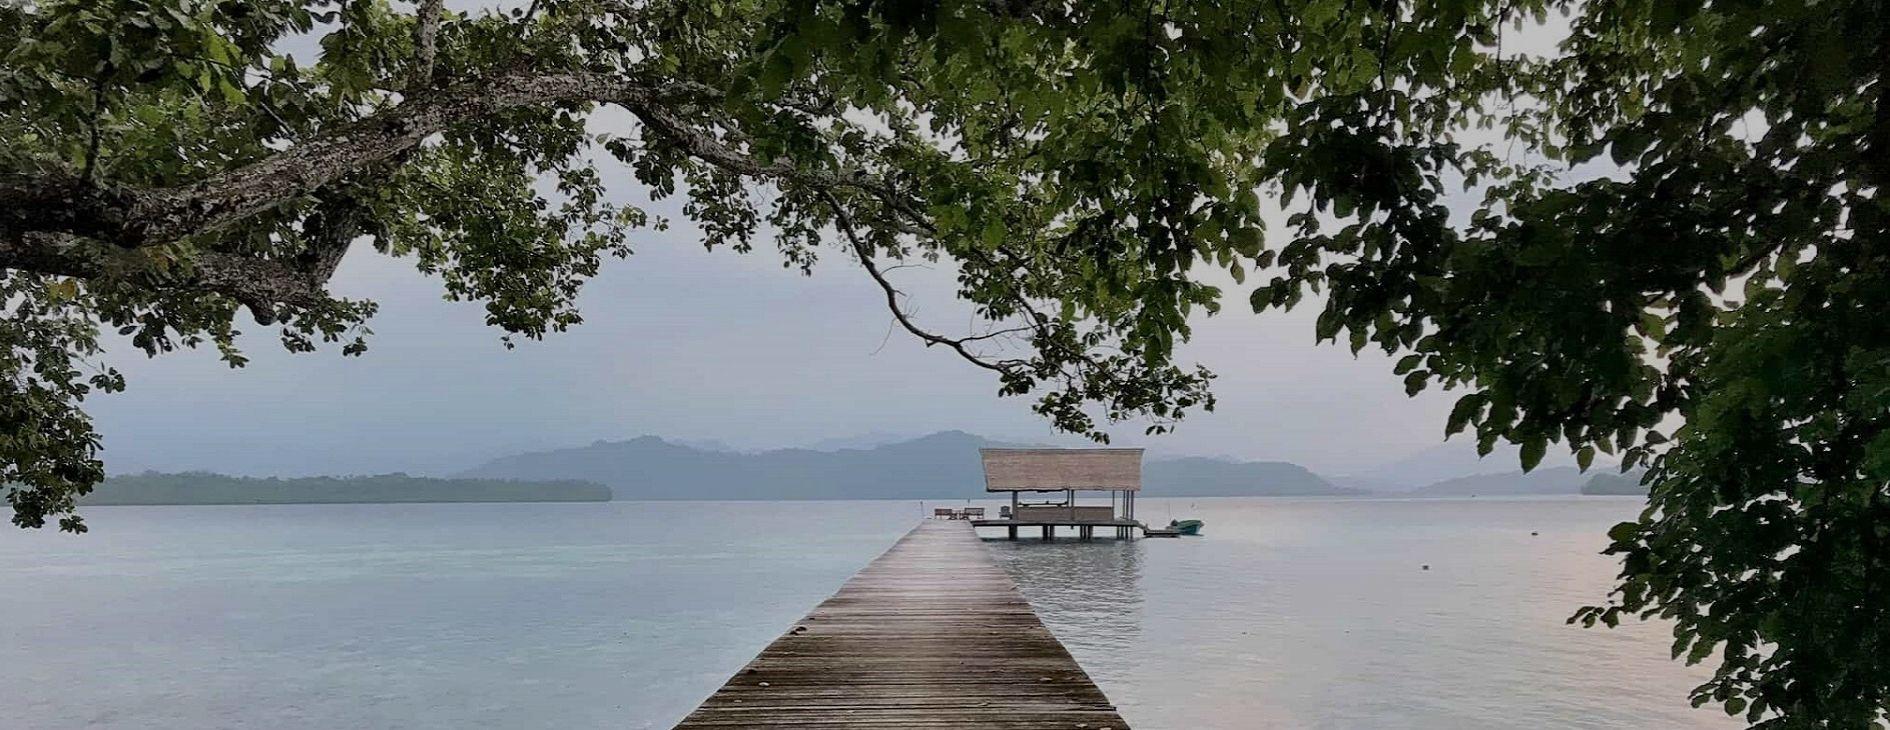 Solomon Islands Tavanipupu Island Resort & Spa travel destinations (7)